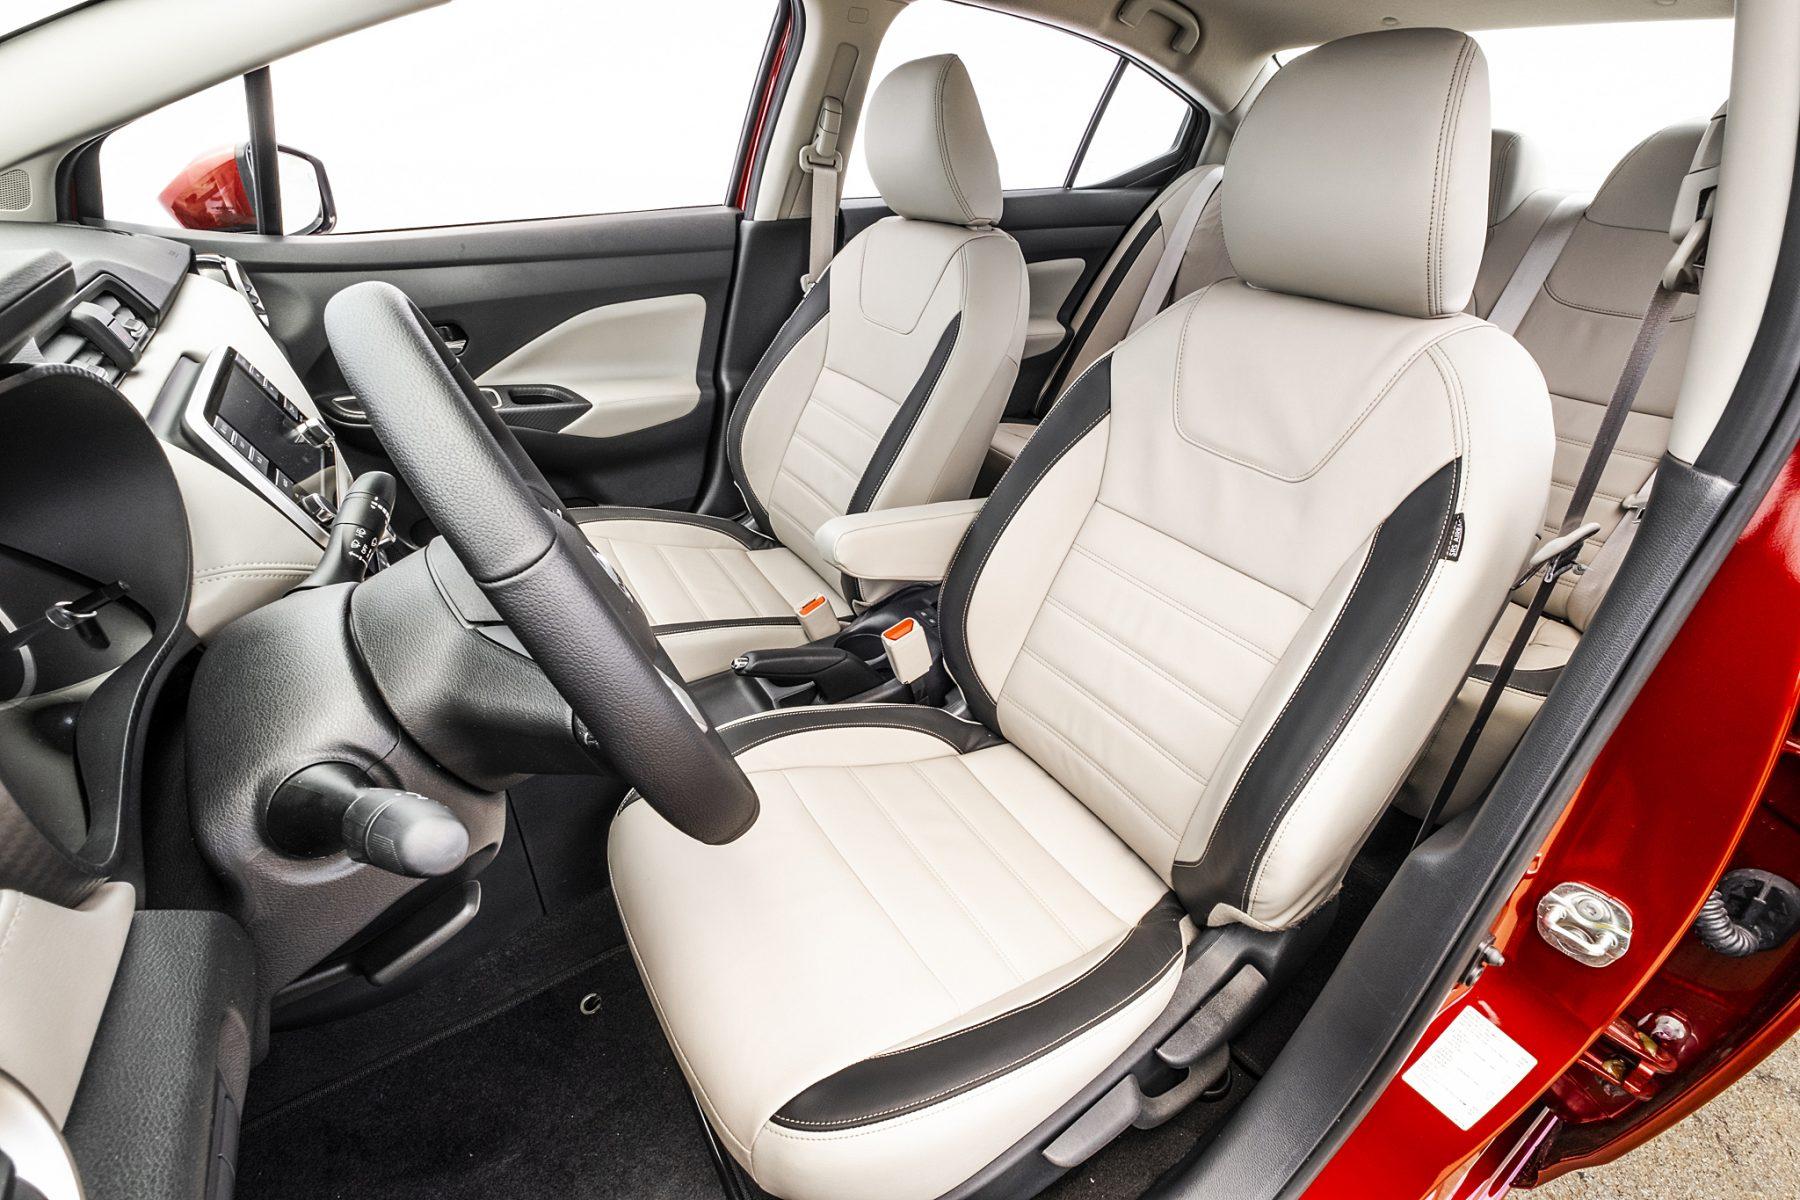 Bancos-novo-Nissan-Versa-2021-739-e1605736353119.jpg